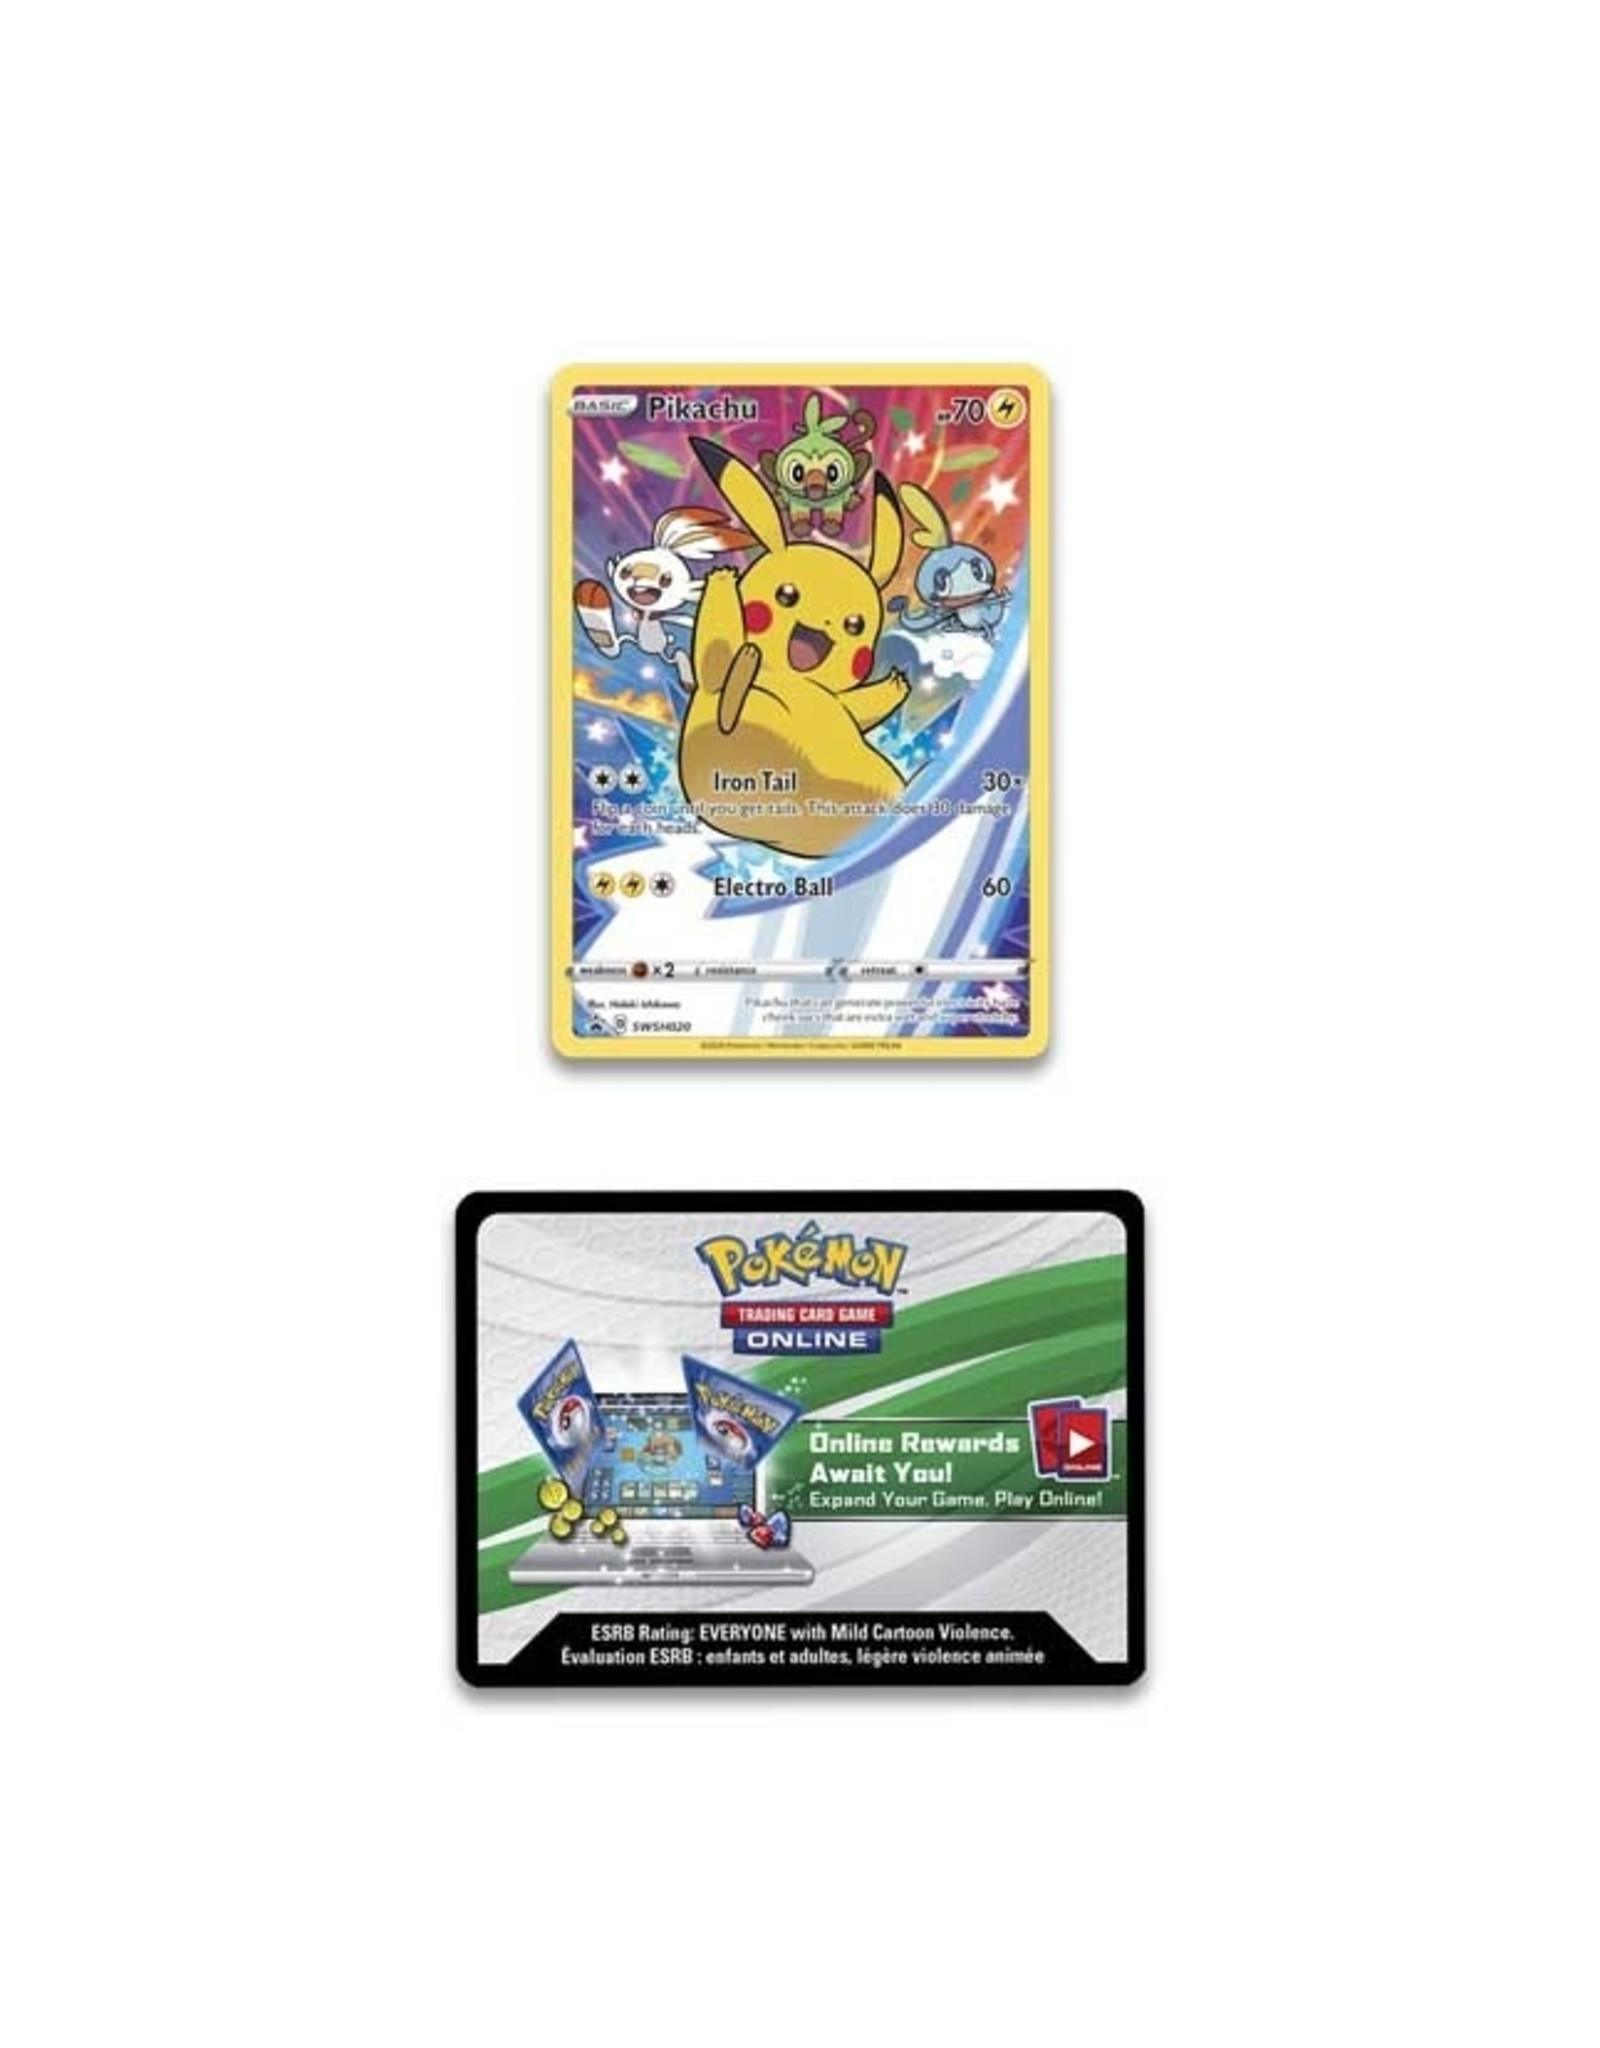 Pokémon Pokémon Trading Card Game: Sword & Shield Figure Collection